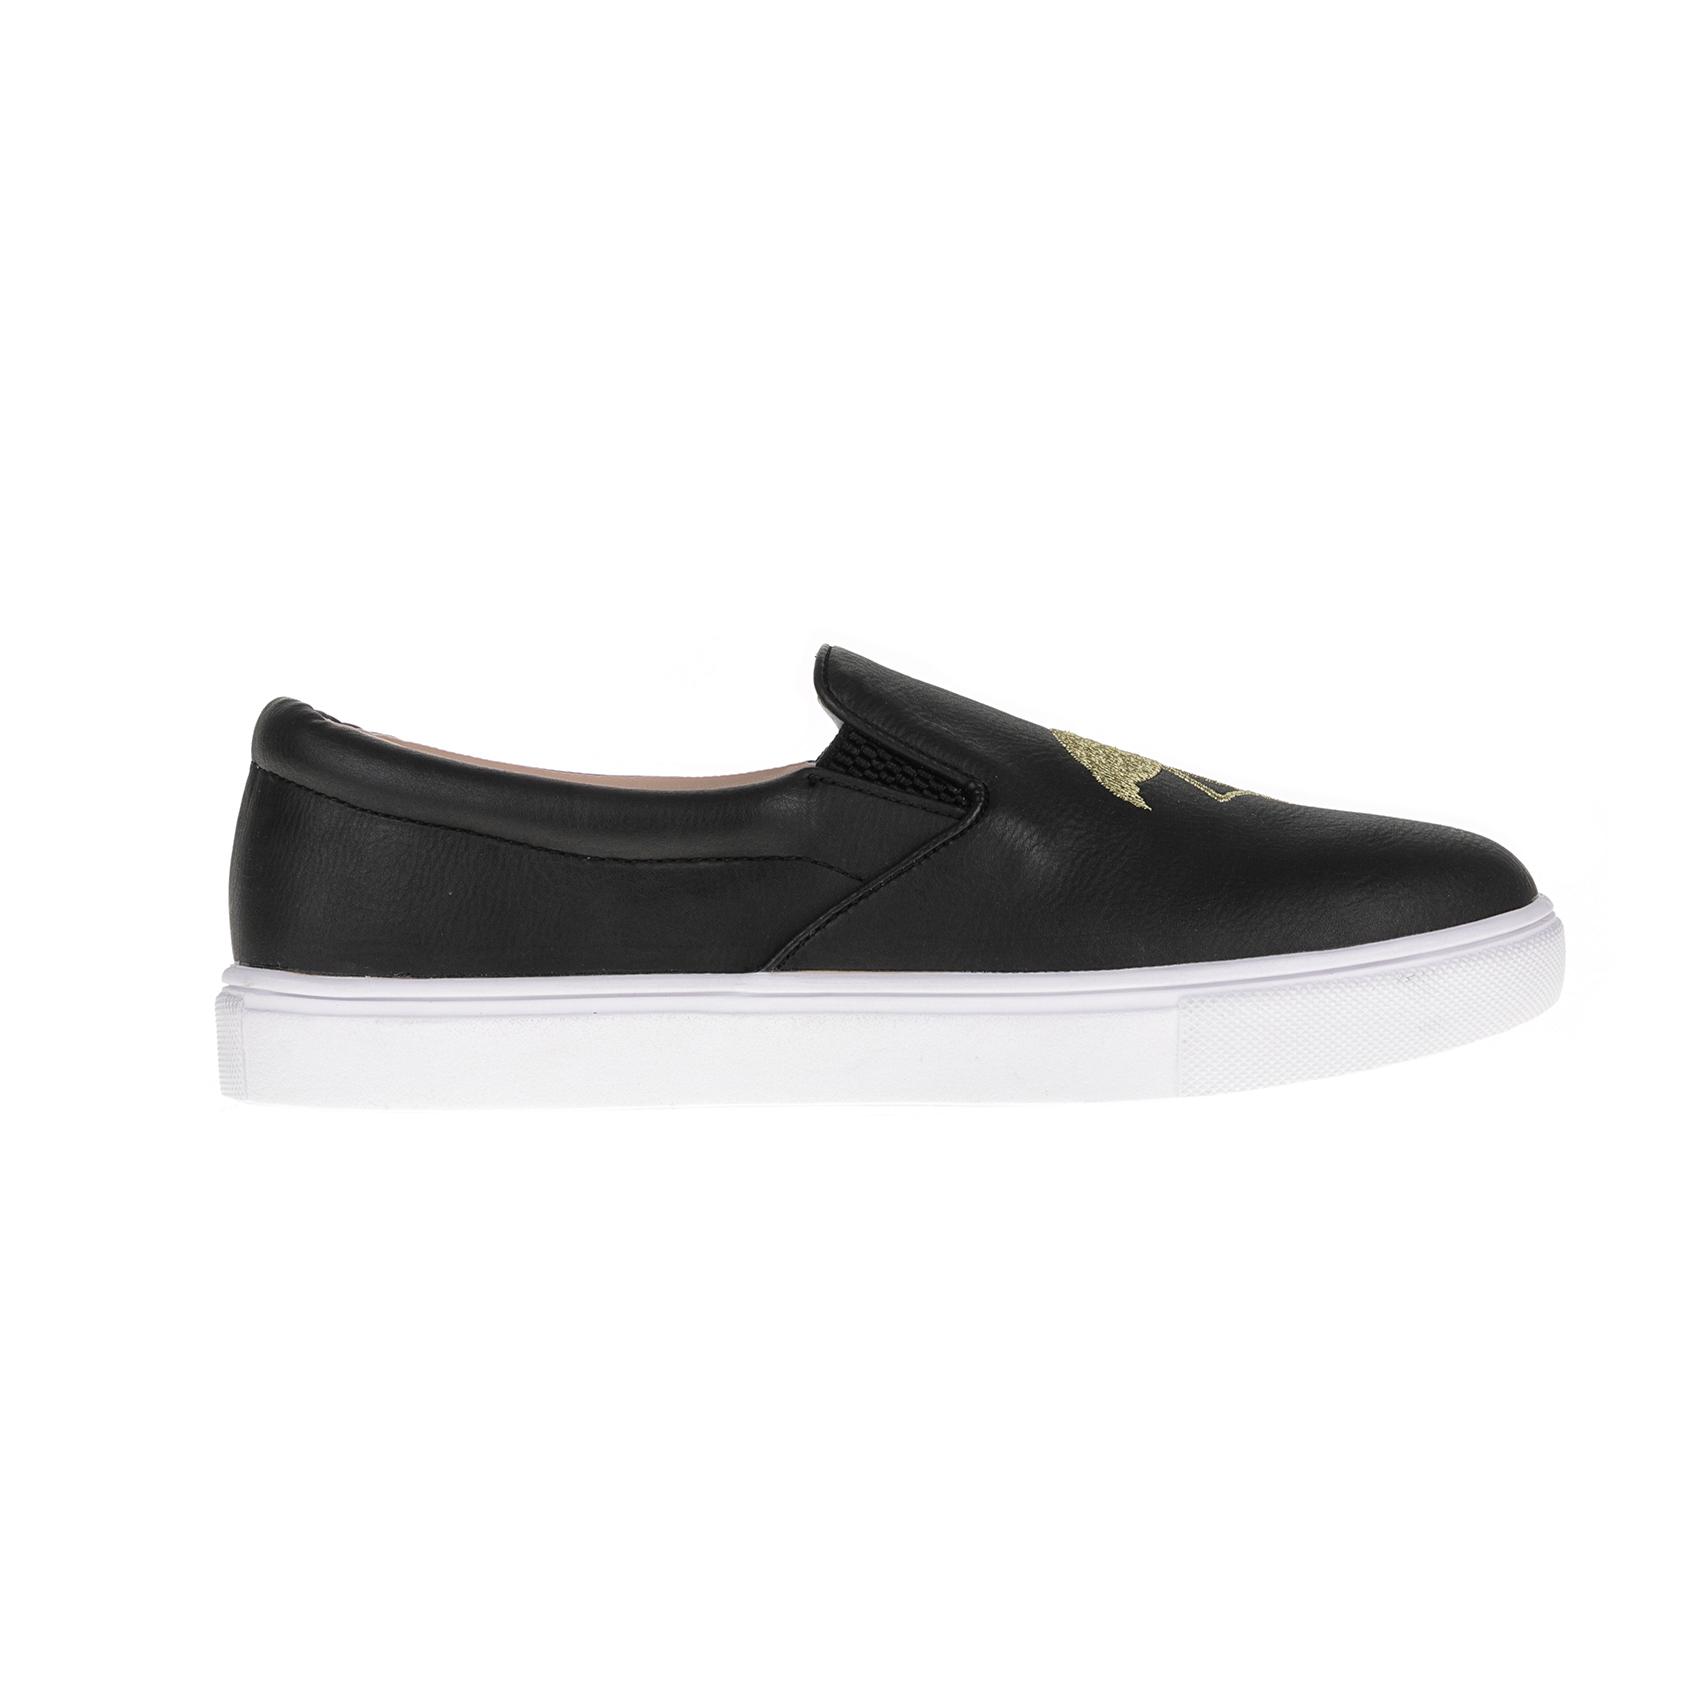 JUICY COUTURE – Γυναικεία παπούτσια JUICY COUTURE ELEAVE μαύρα